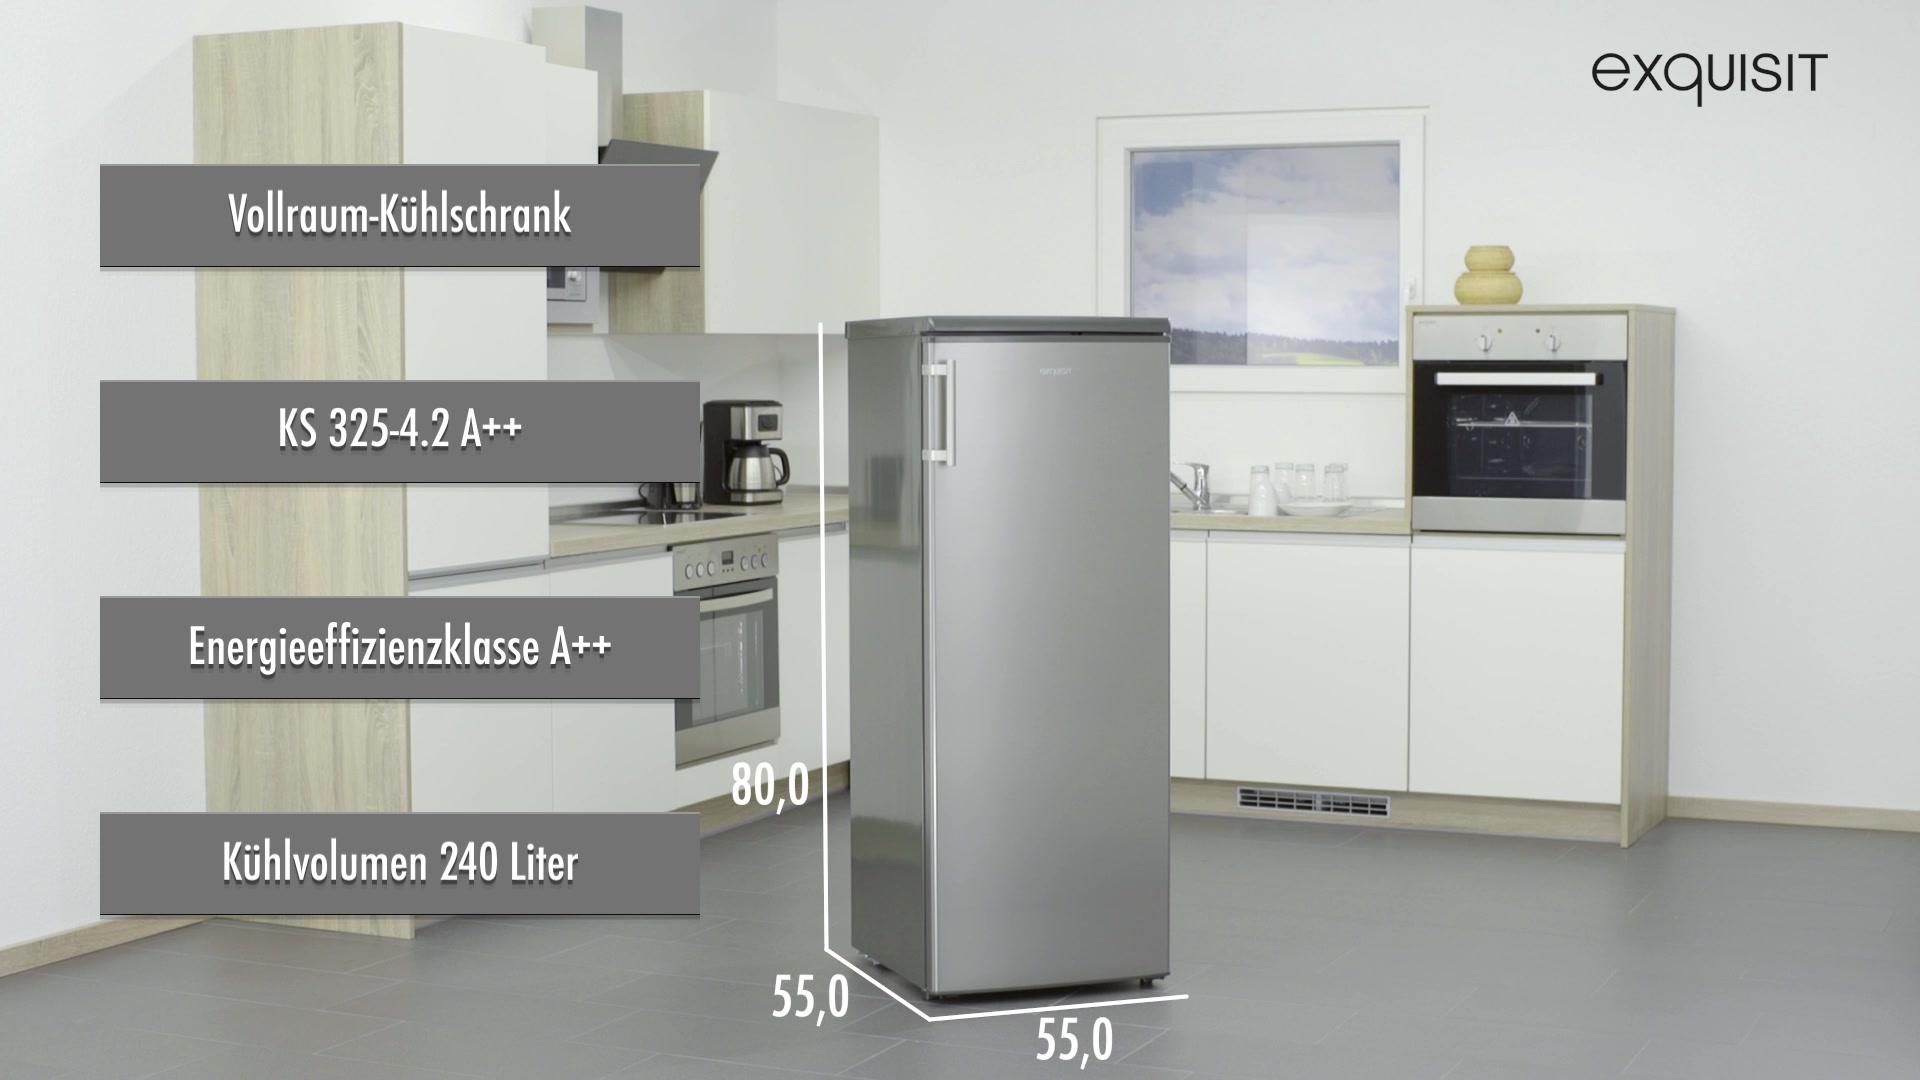 Kühlschrank Vollraum : Exquisit kühlschrank ks a a cm hoch hagebau